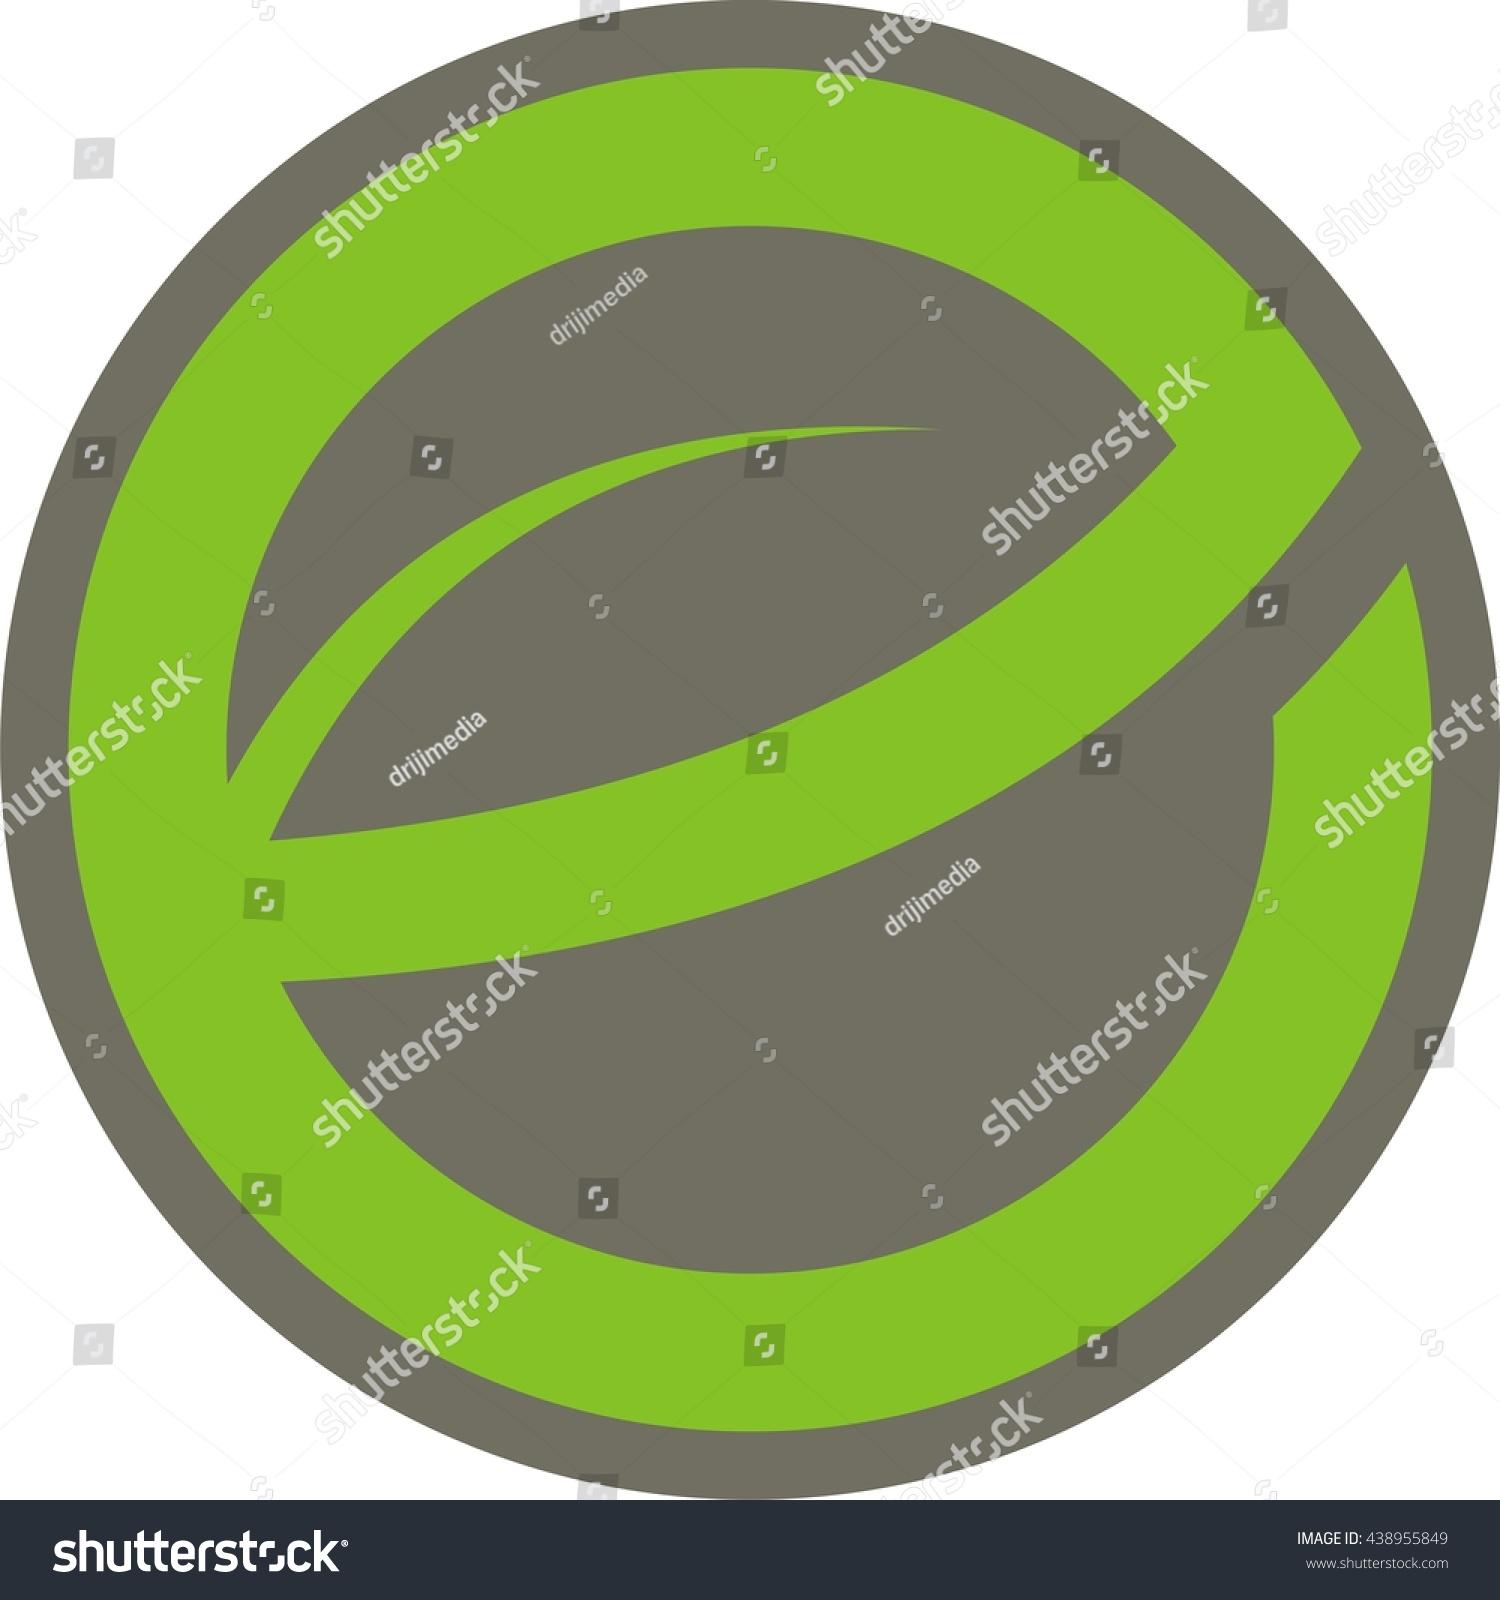 Leave letter e circle logo design stock vector 438955849 shutterstock leave letter e in circle logo design altavistaventures Images